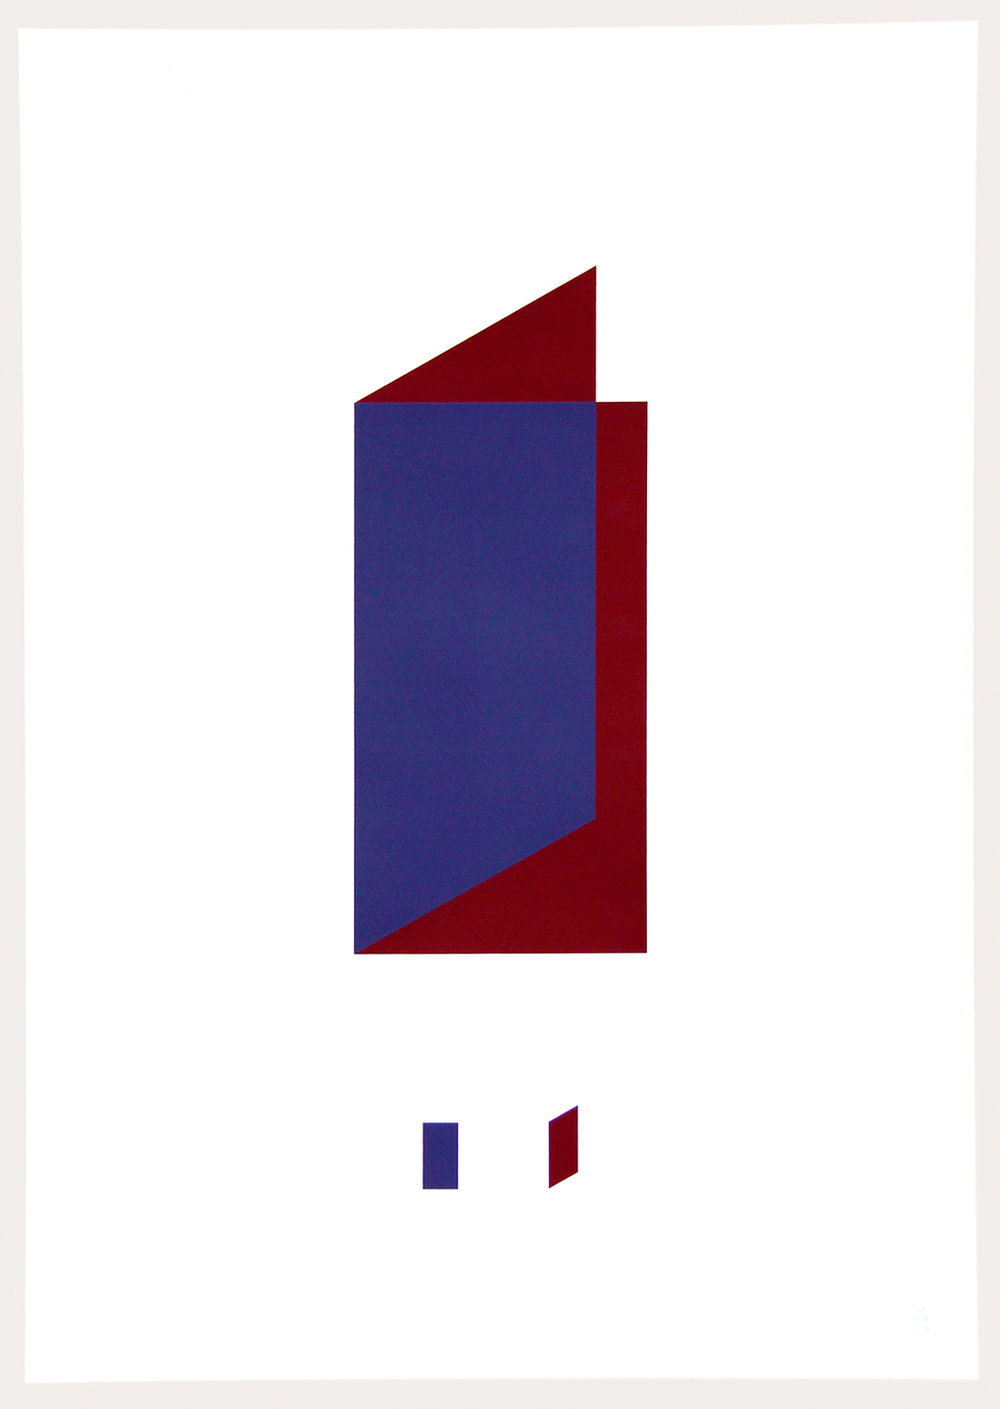 inout (Dialéctica)-2016 Serigrafia dos colores Dimensiones w:47cm h:67cm Serie de 5 $70.000.-